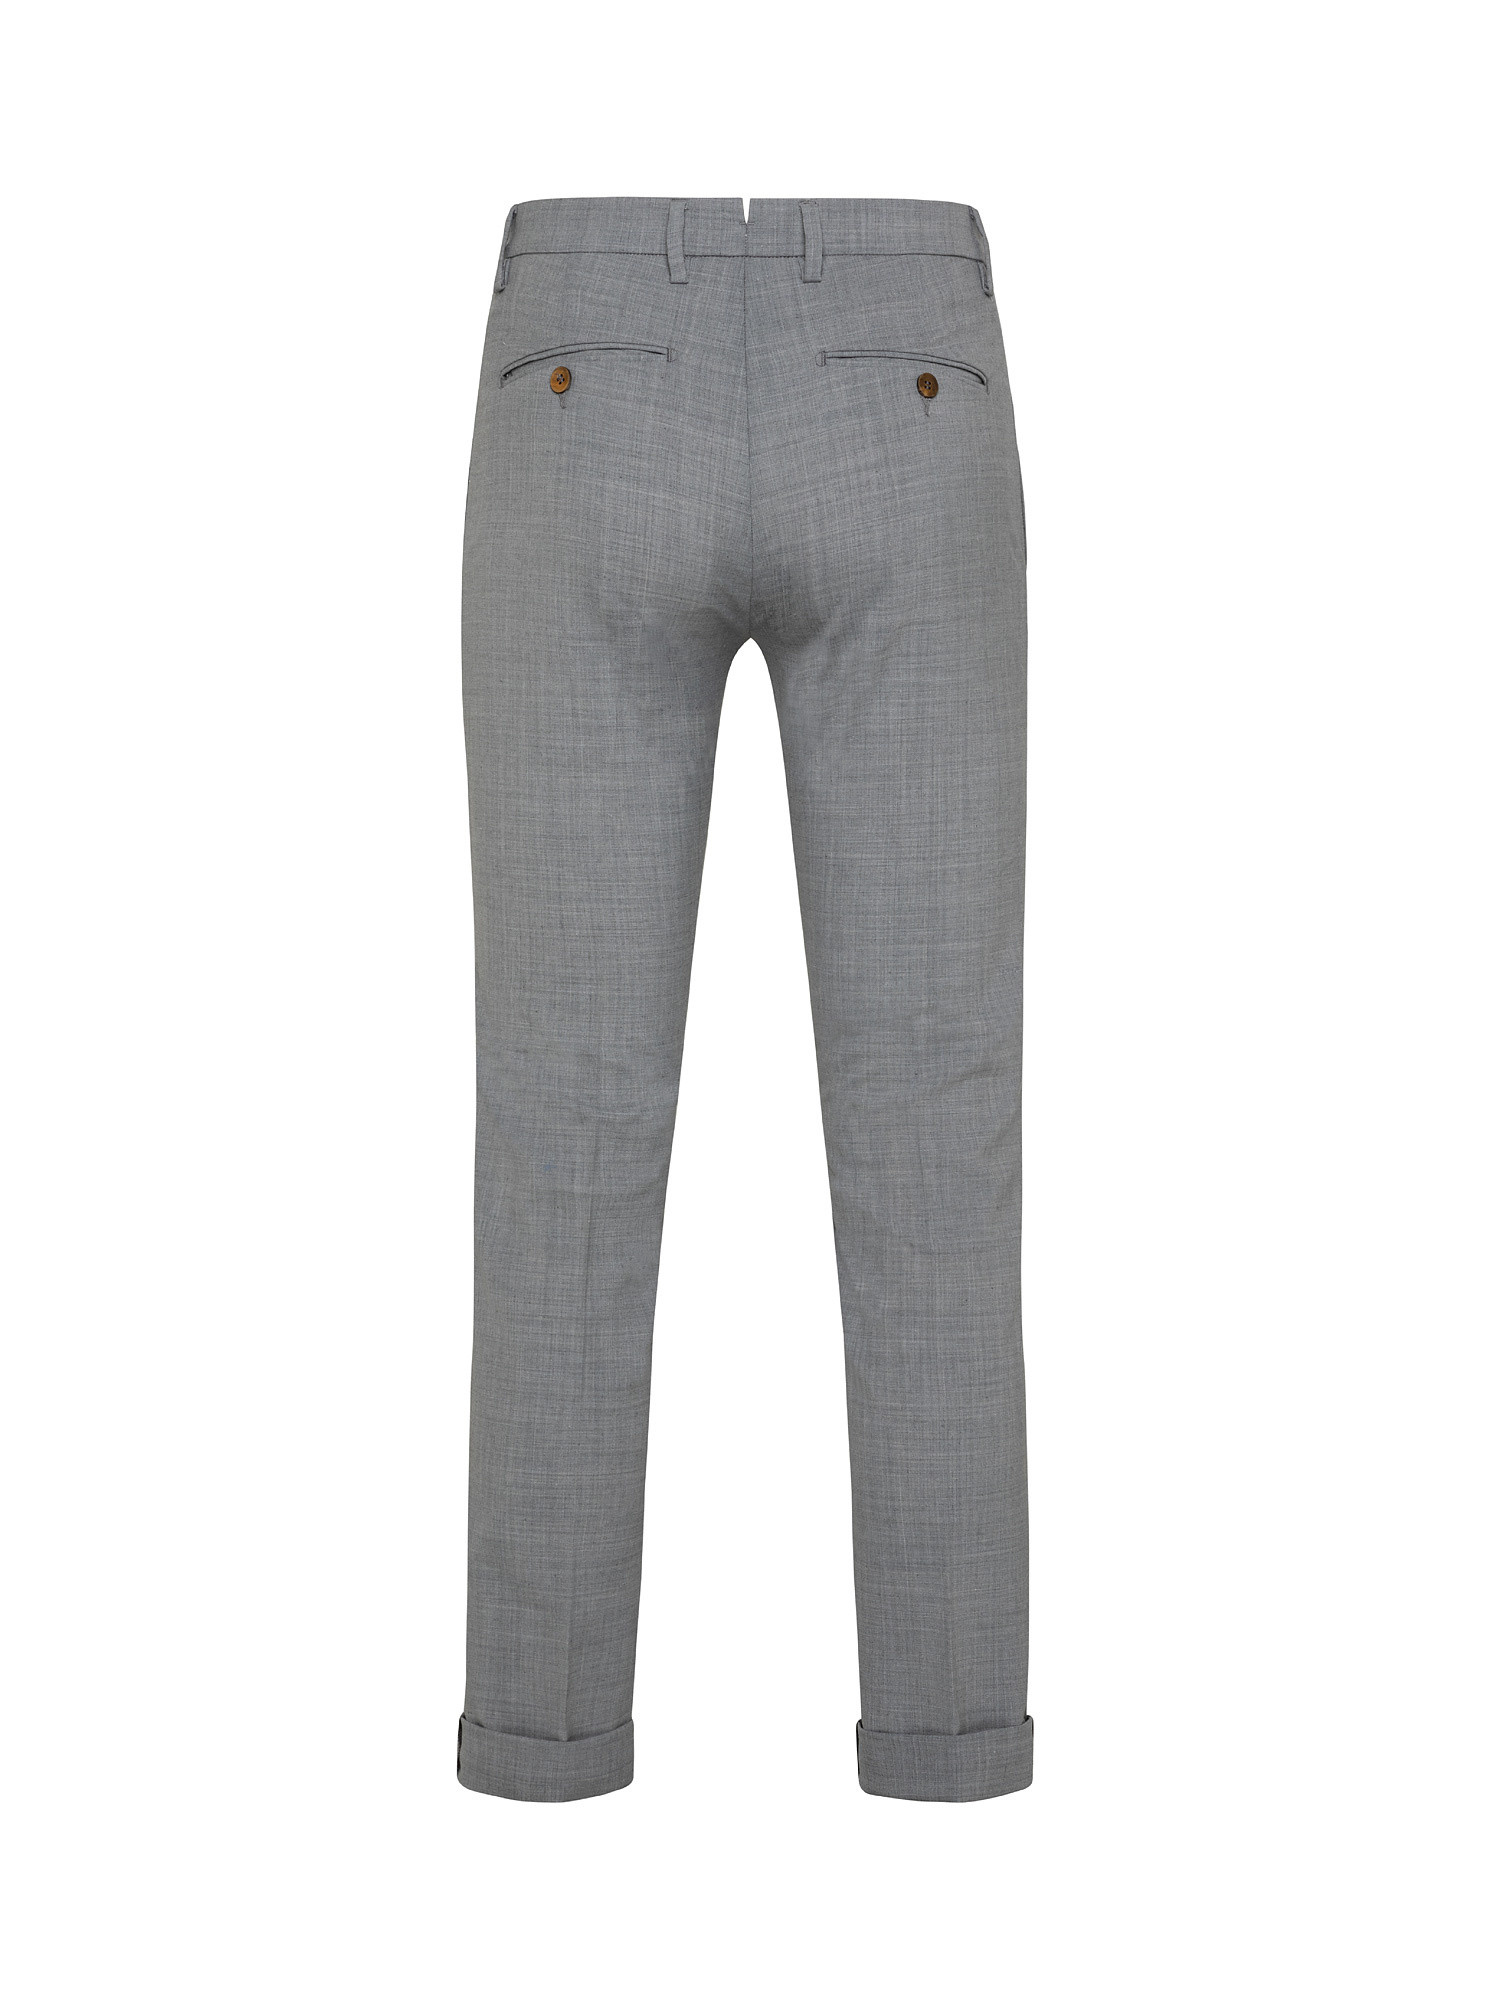 Pantalone chino misto lana, Grigio, large image number 1